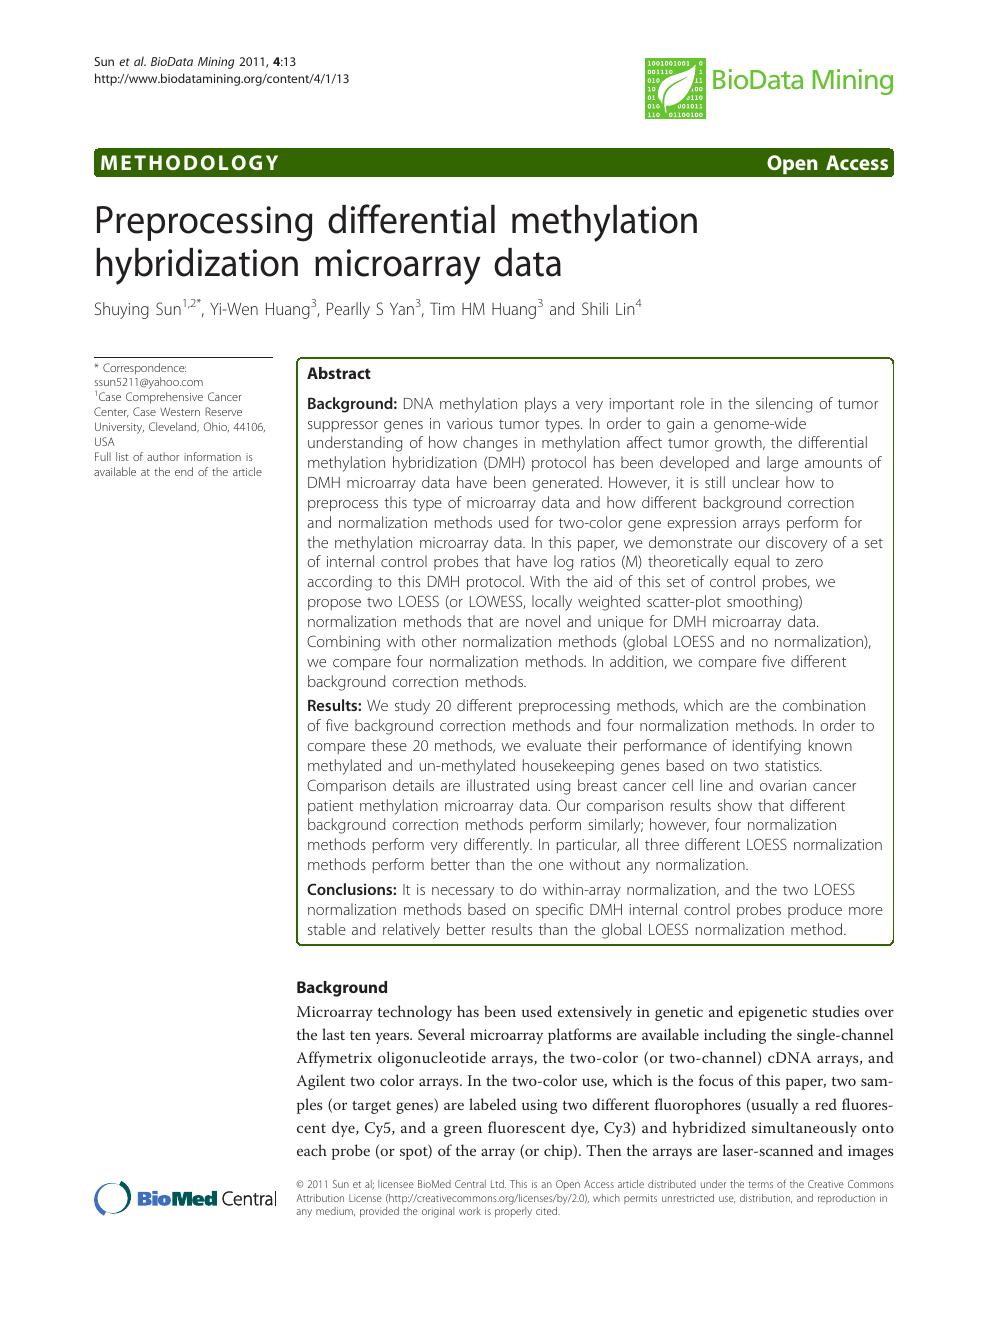 Preprocessing differential methylation hybridization